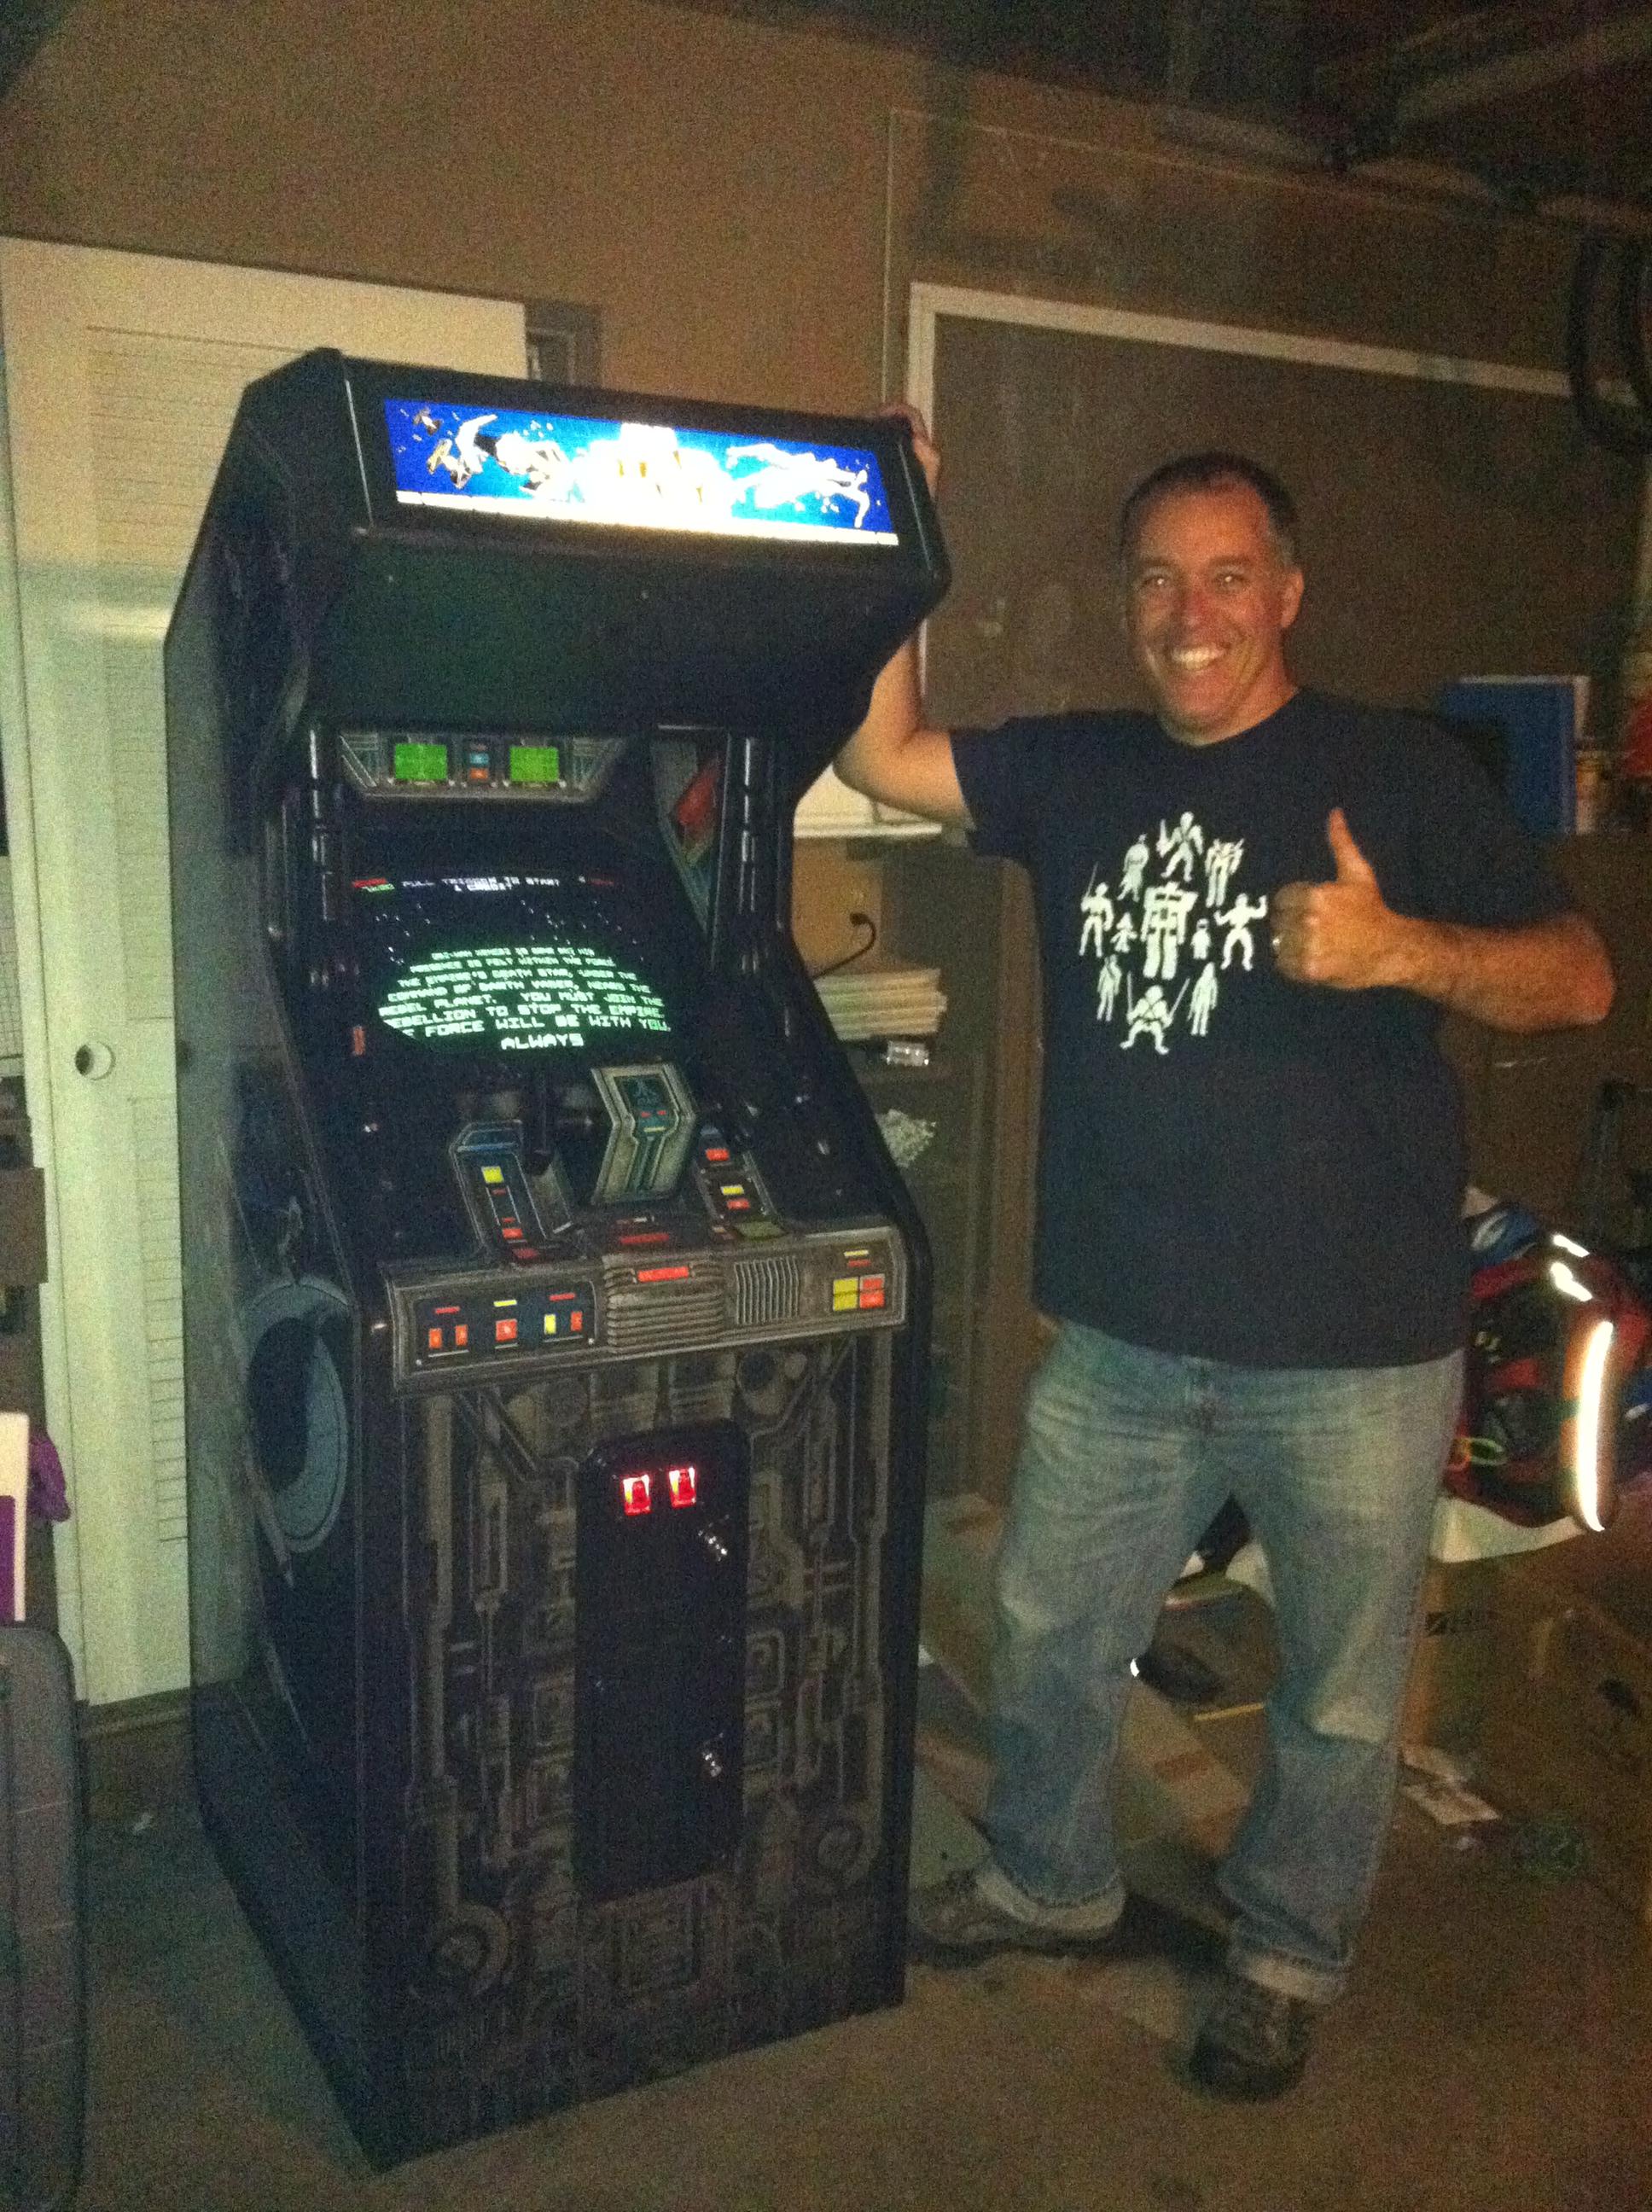 My Time Machine Star Wars Arcade From 1983 Dorkdaddy Com